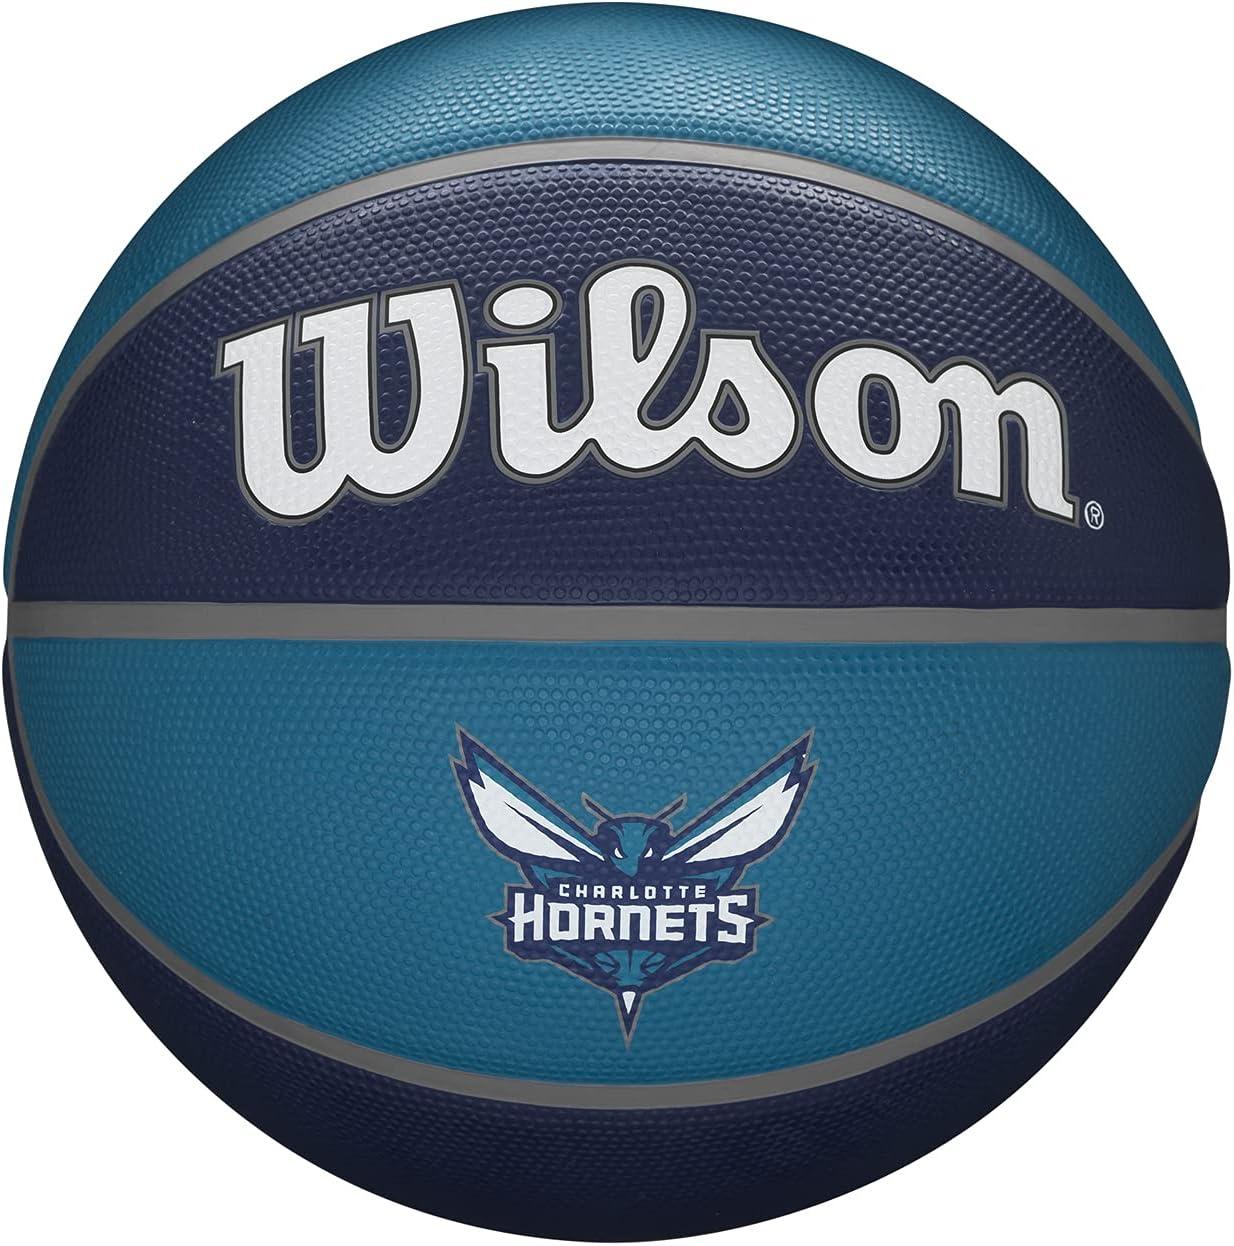 Wilson overseas NBA Team Choice Basketballs Tribute